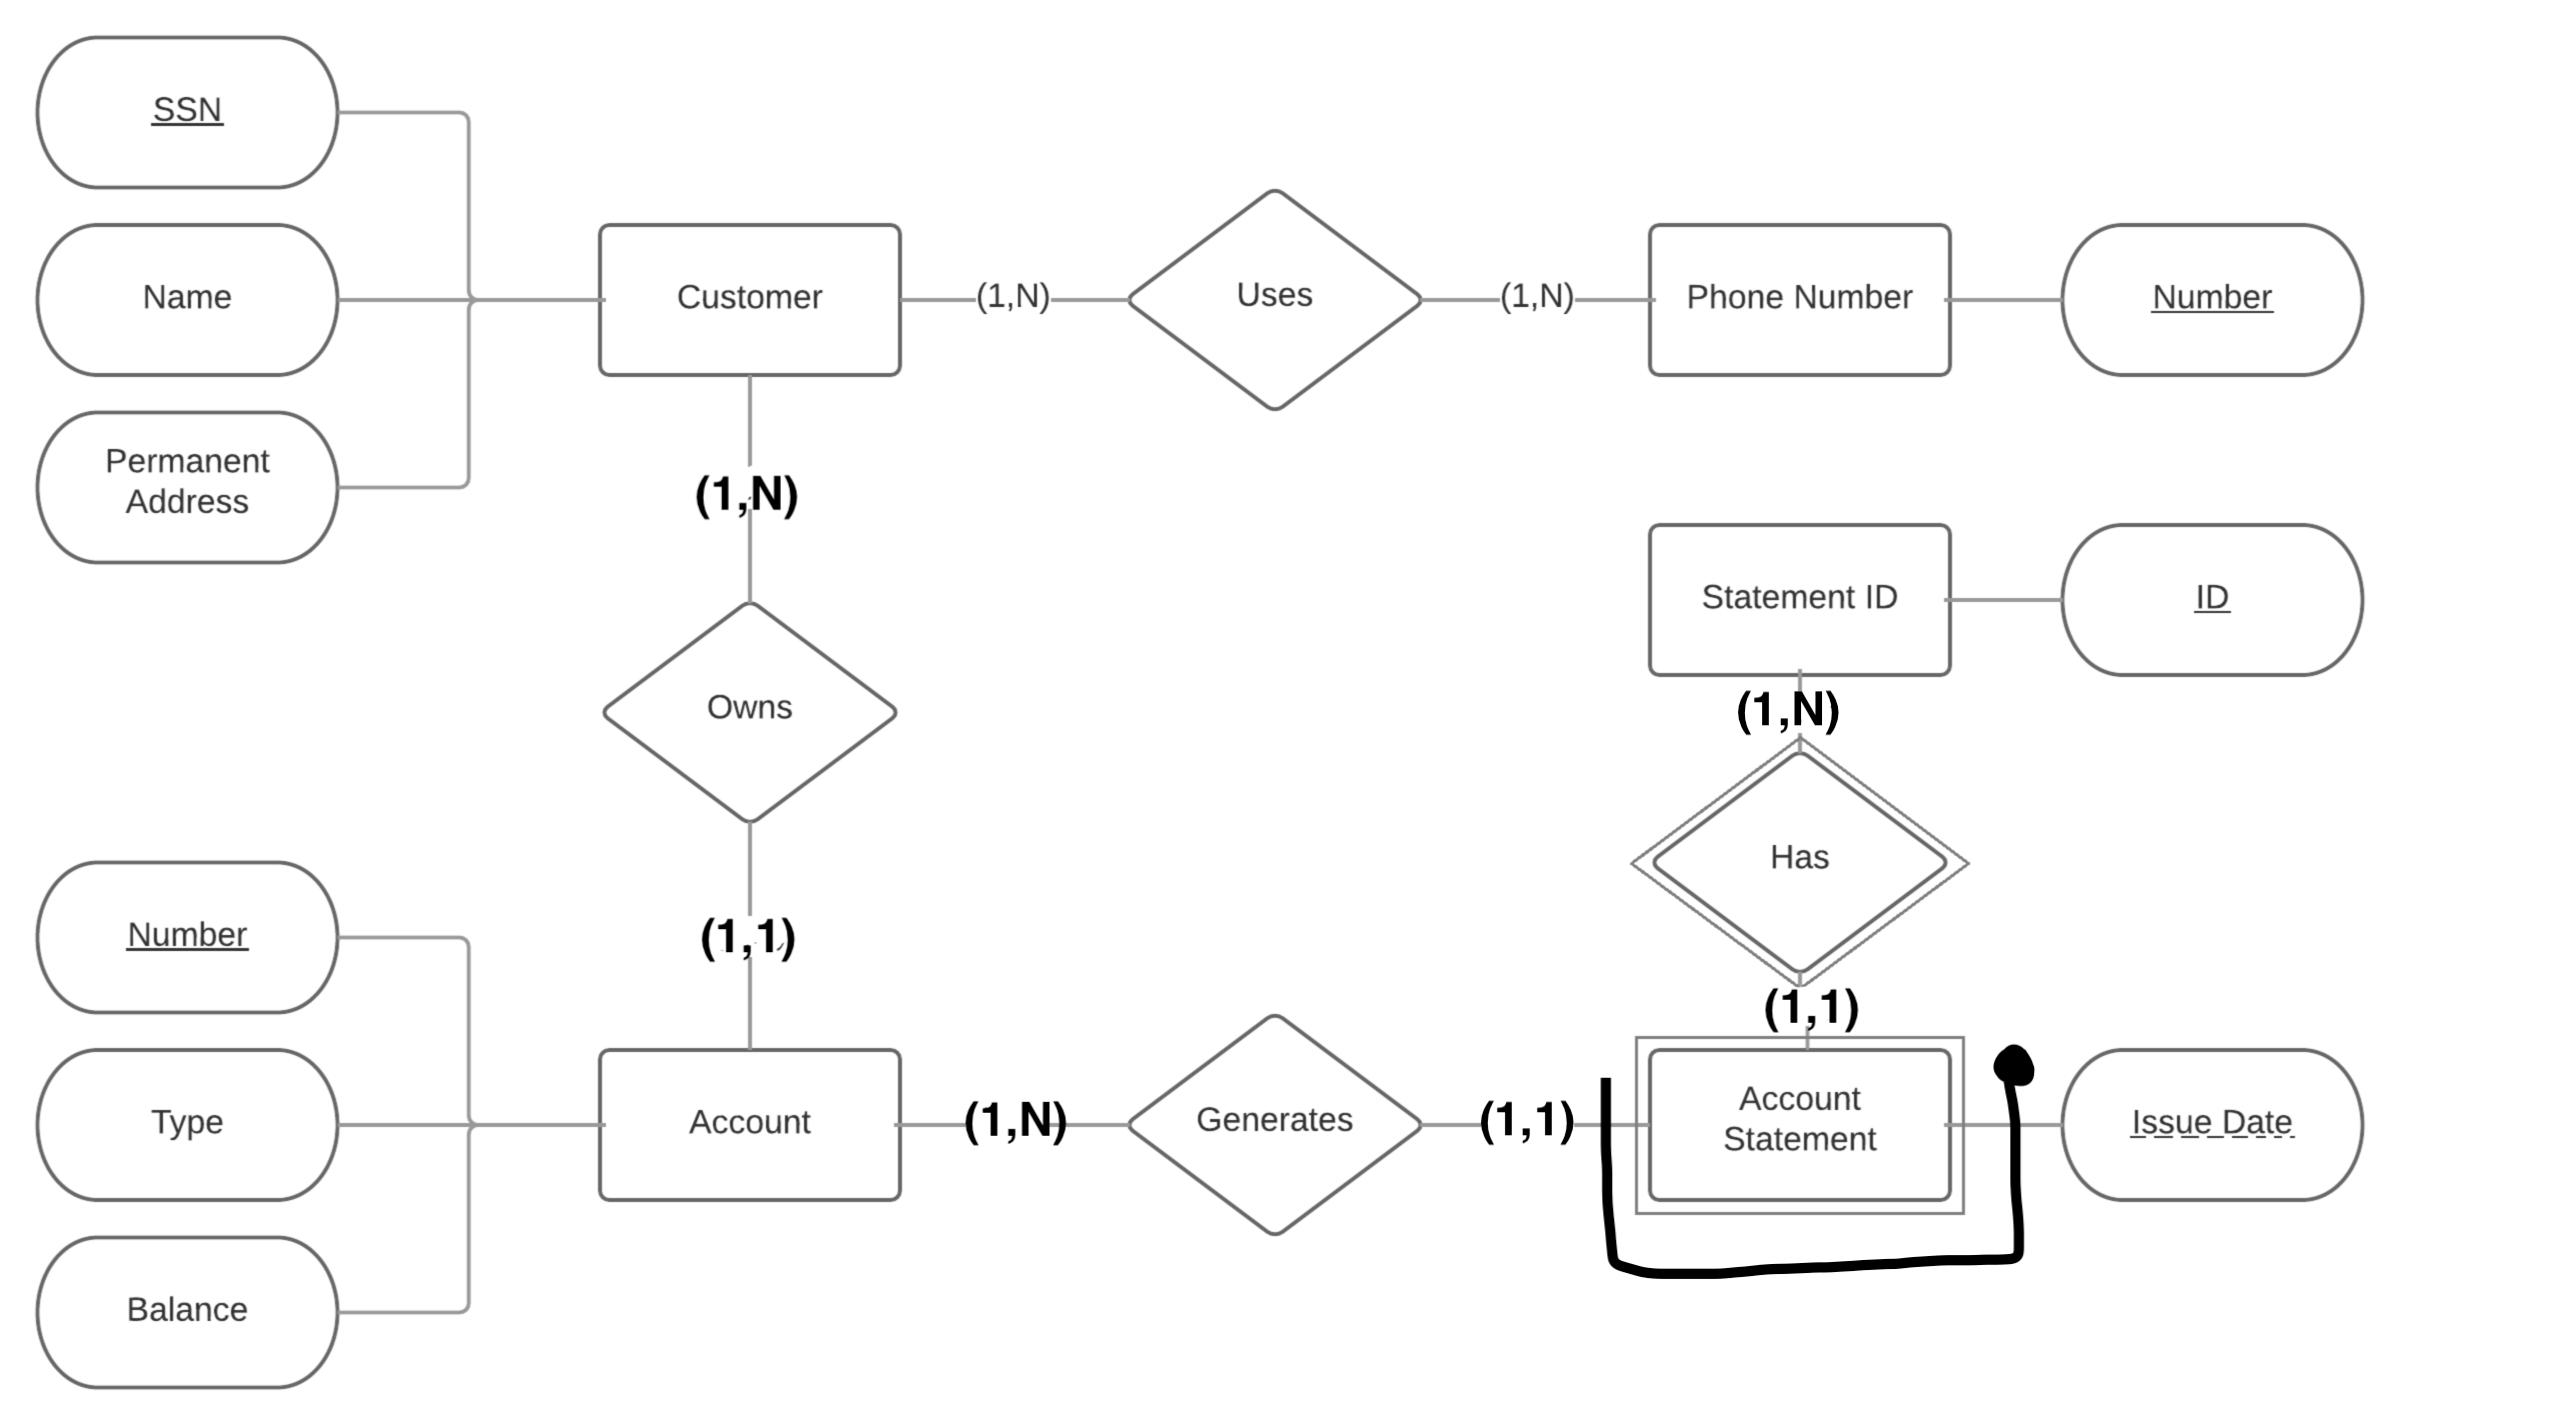 Database Design - Is My Entity-Relationship Diagram About regarding Er Diagram Between 3 Entities